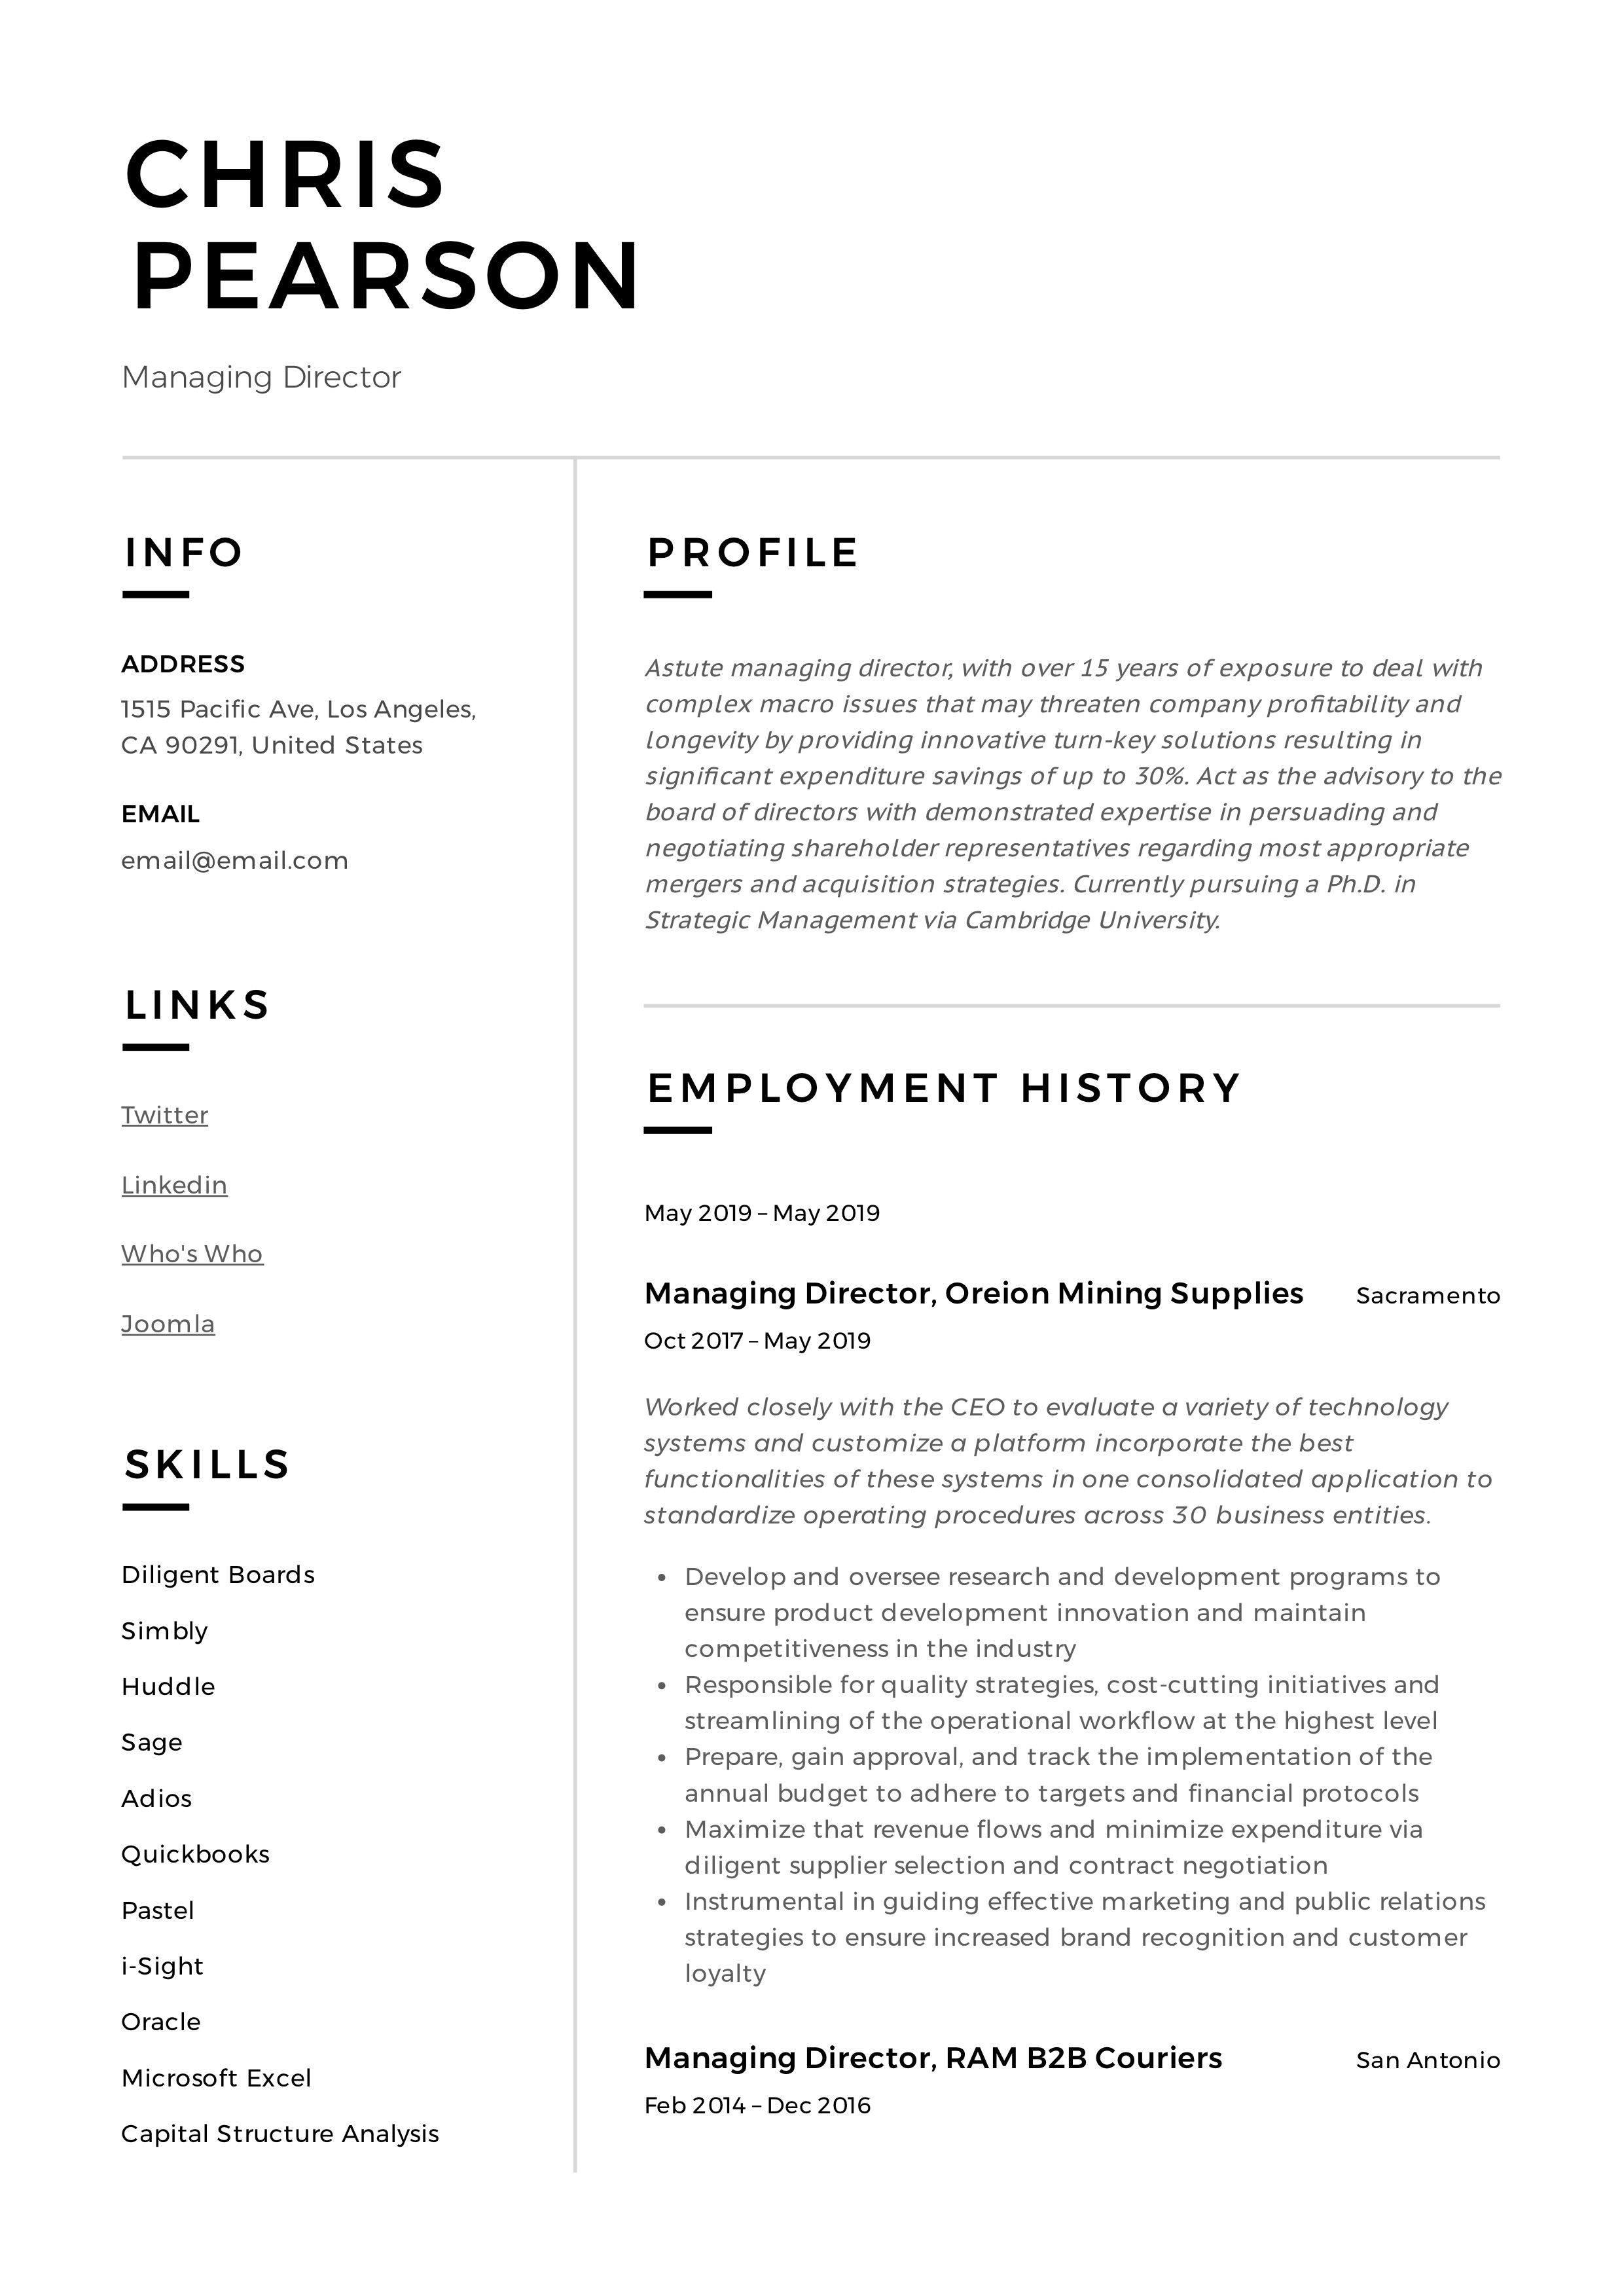 Managing Director Resume Sample in 2020 Guided writing